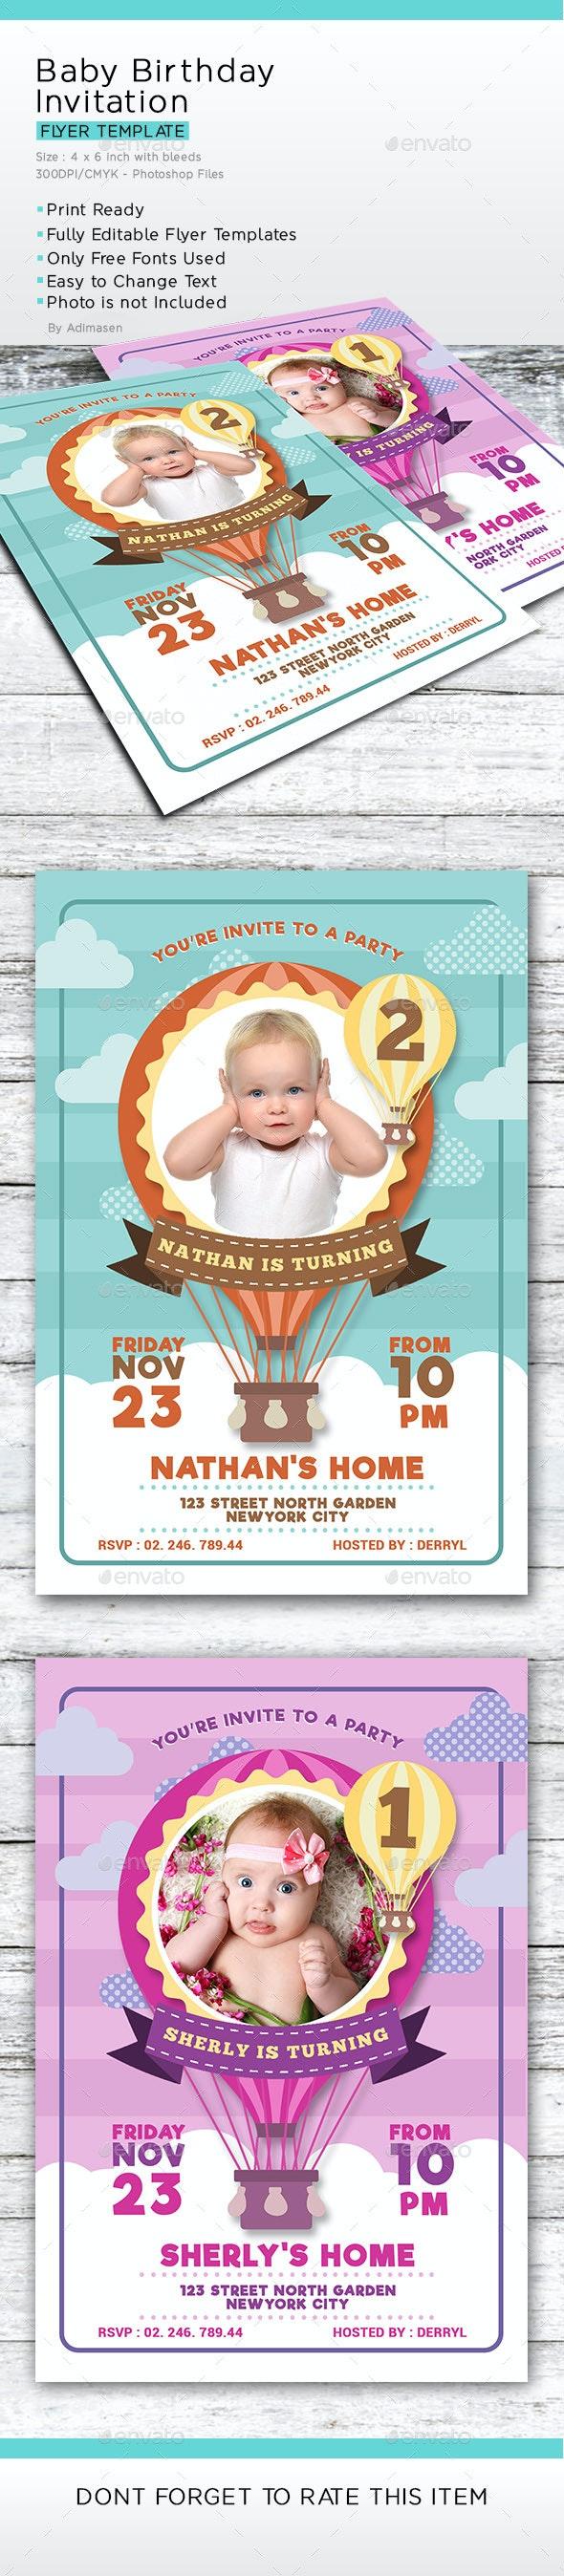 Baby Birthday Invitation - Birthday Greeting Cards